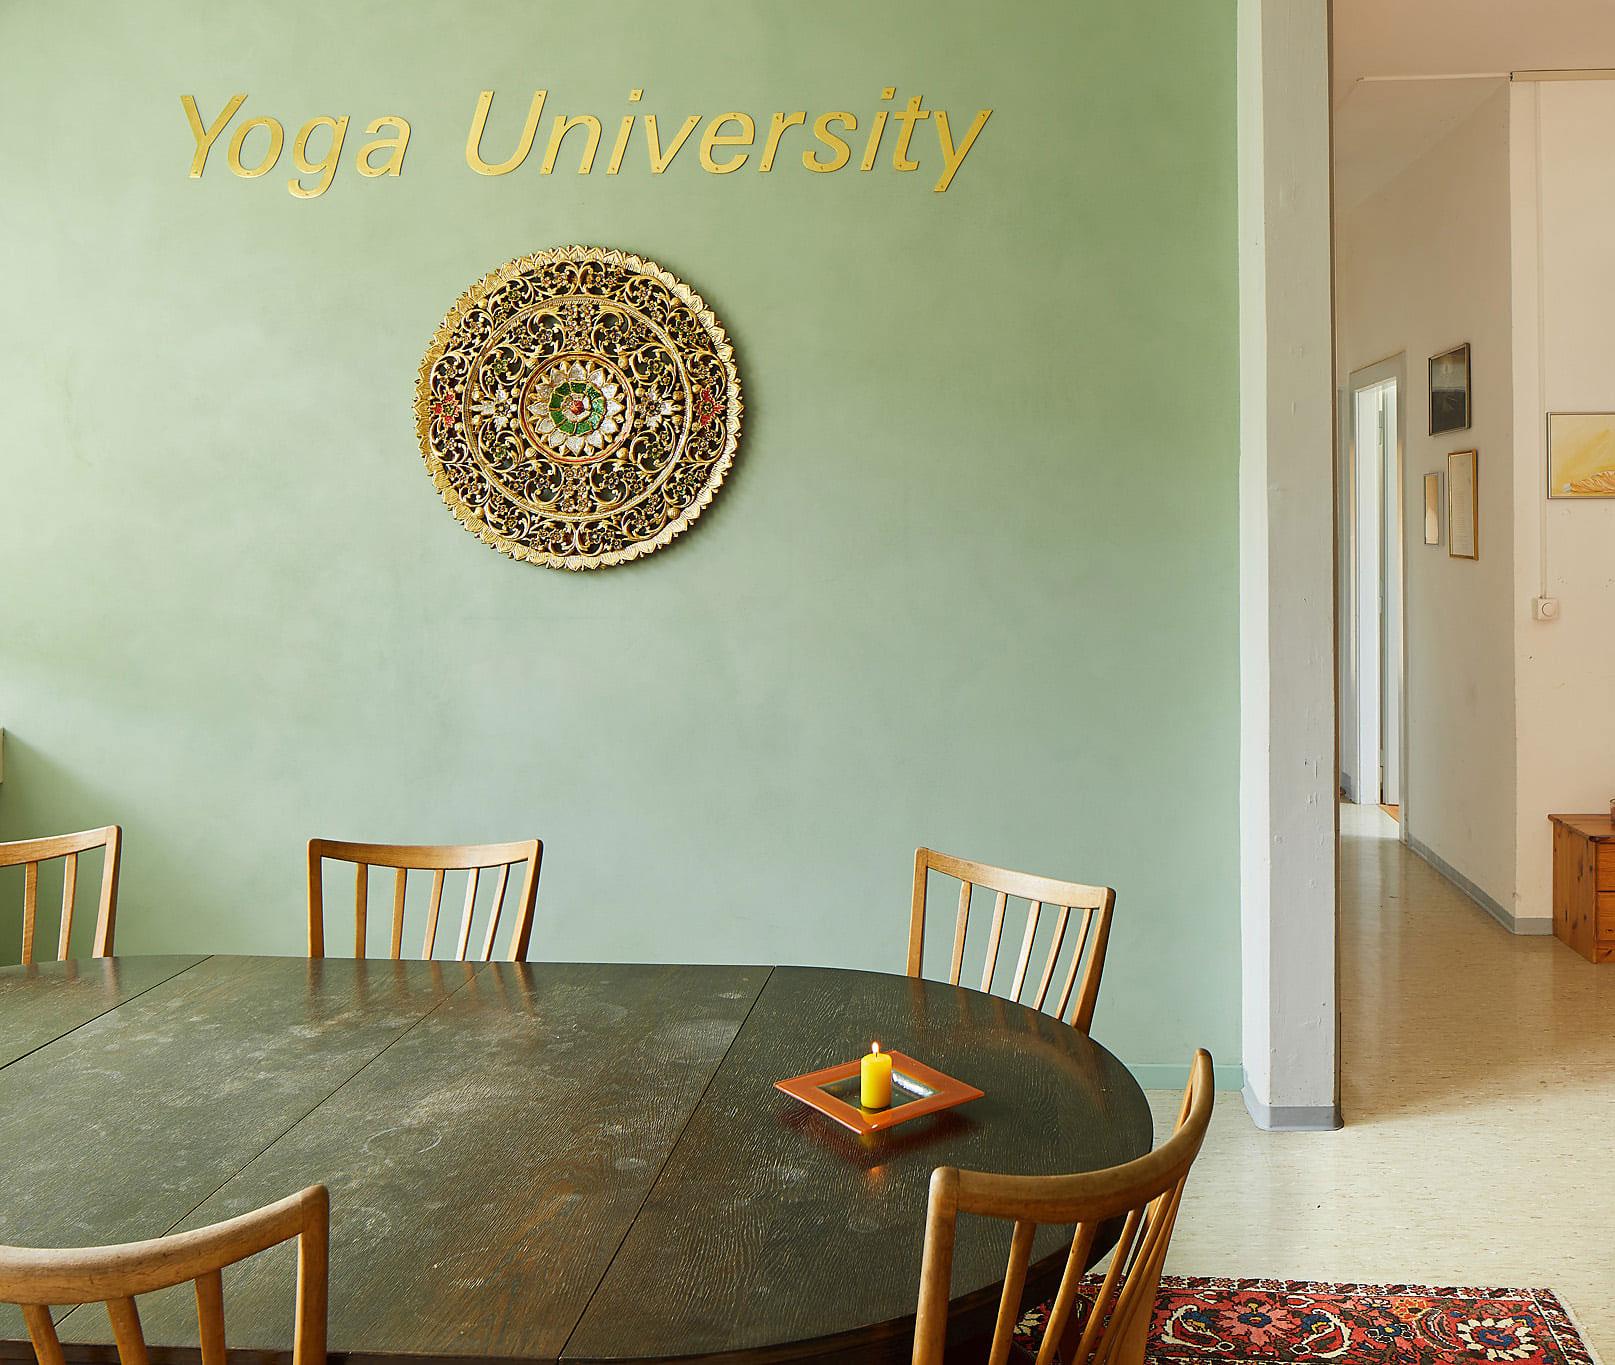 Yoga-University-Campus-7